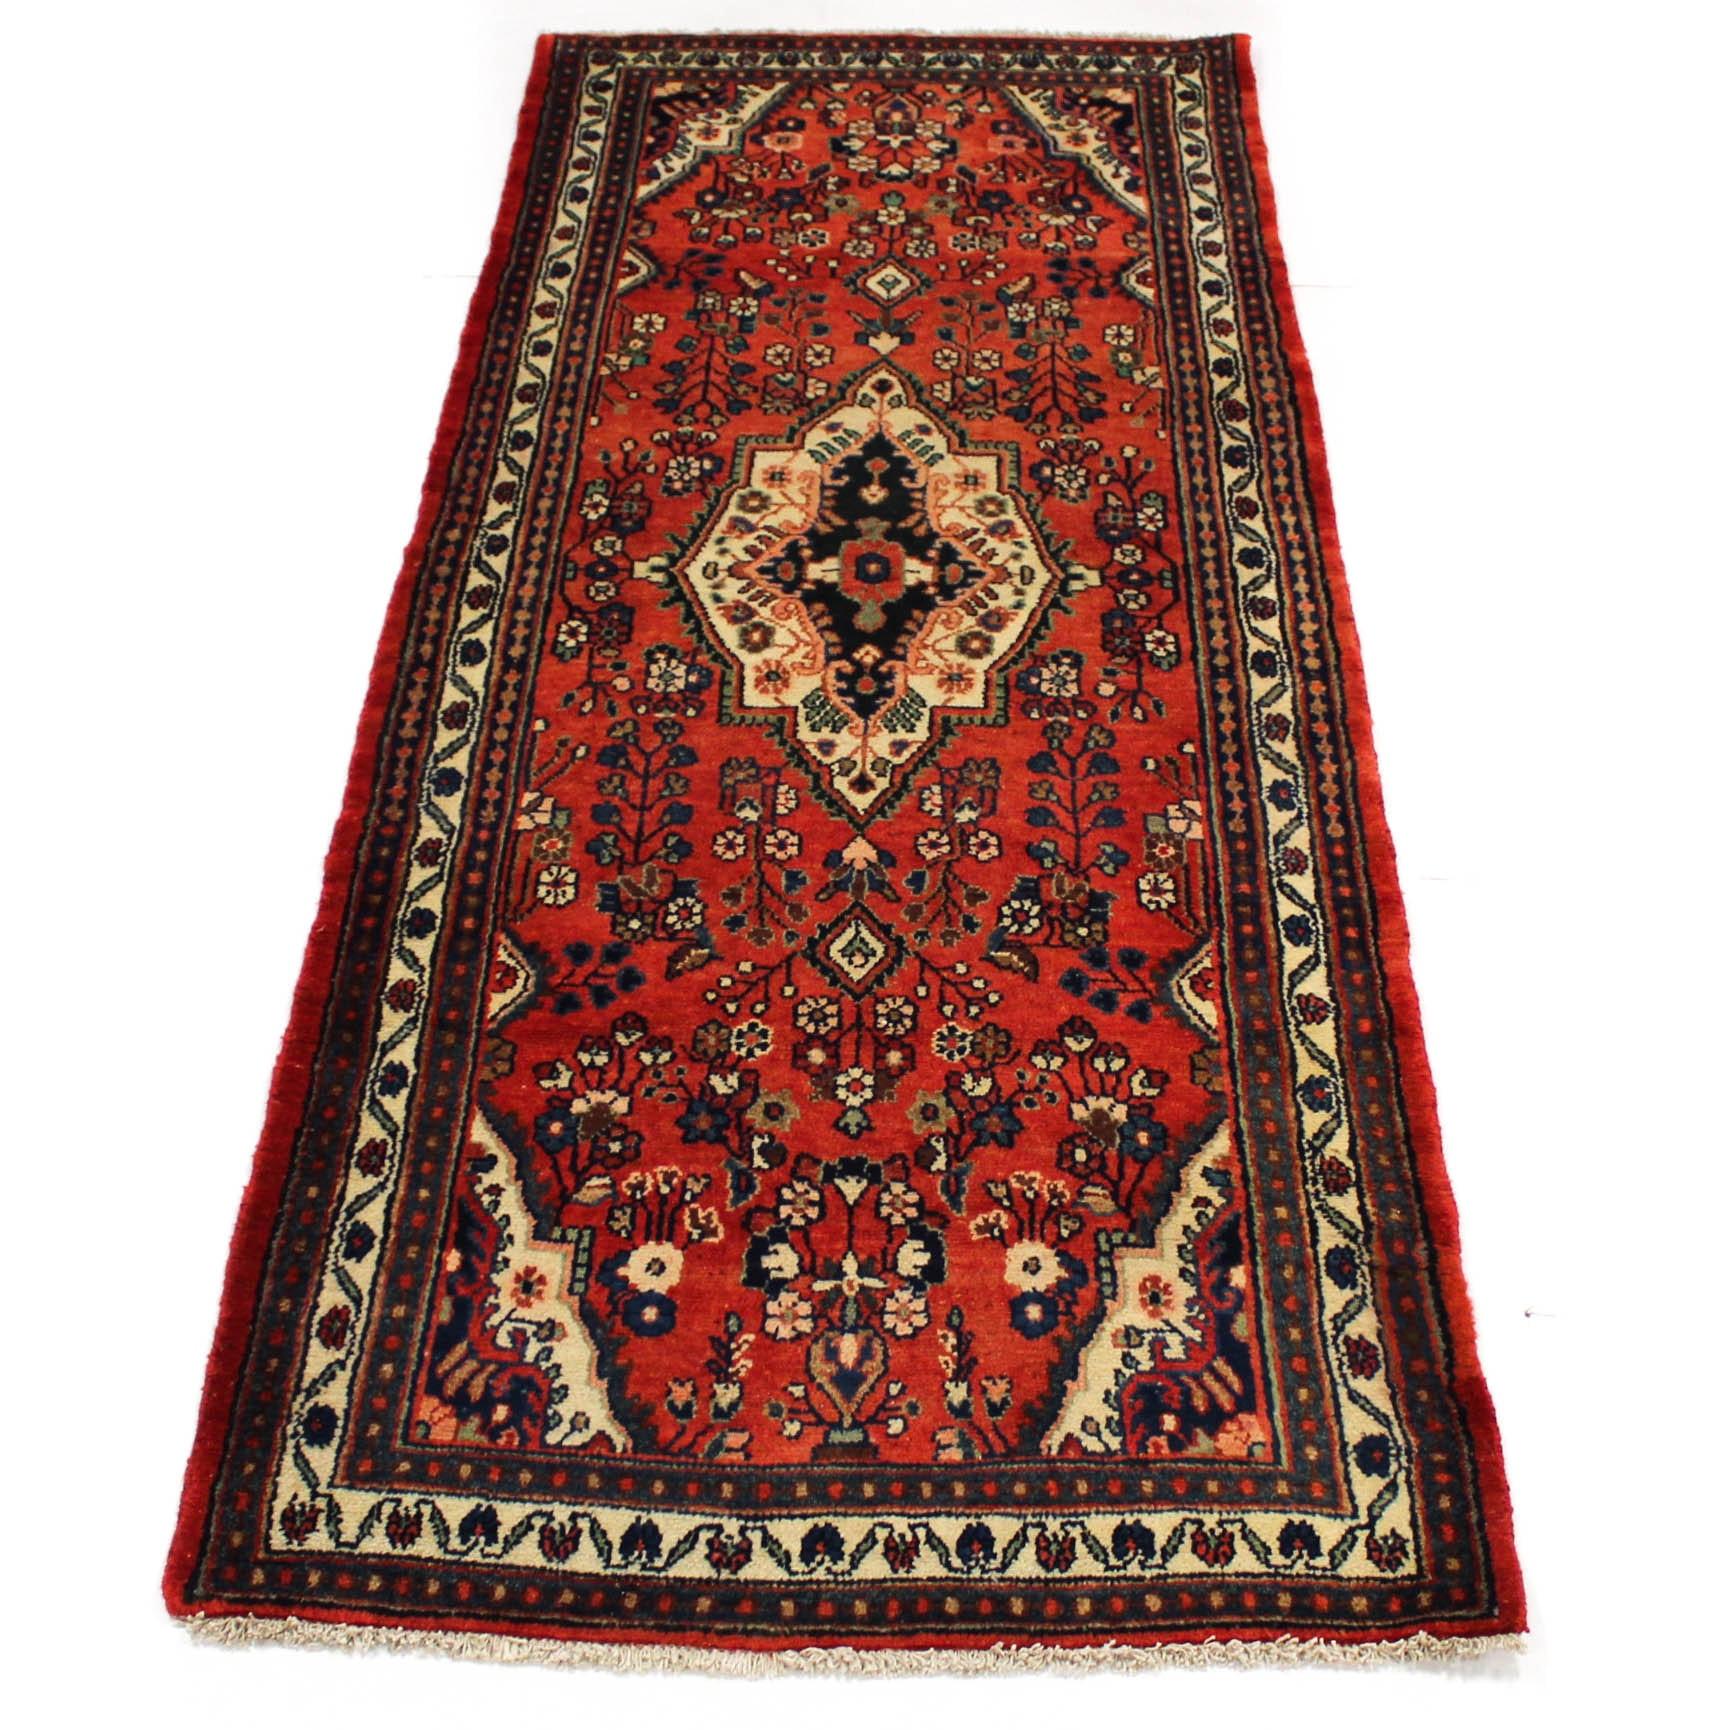 3'7 x 9'7 Semi-Antique Hand-Knotted Persian Darjezine Carpet Runner